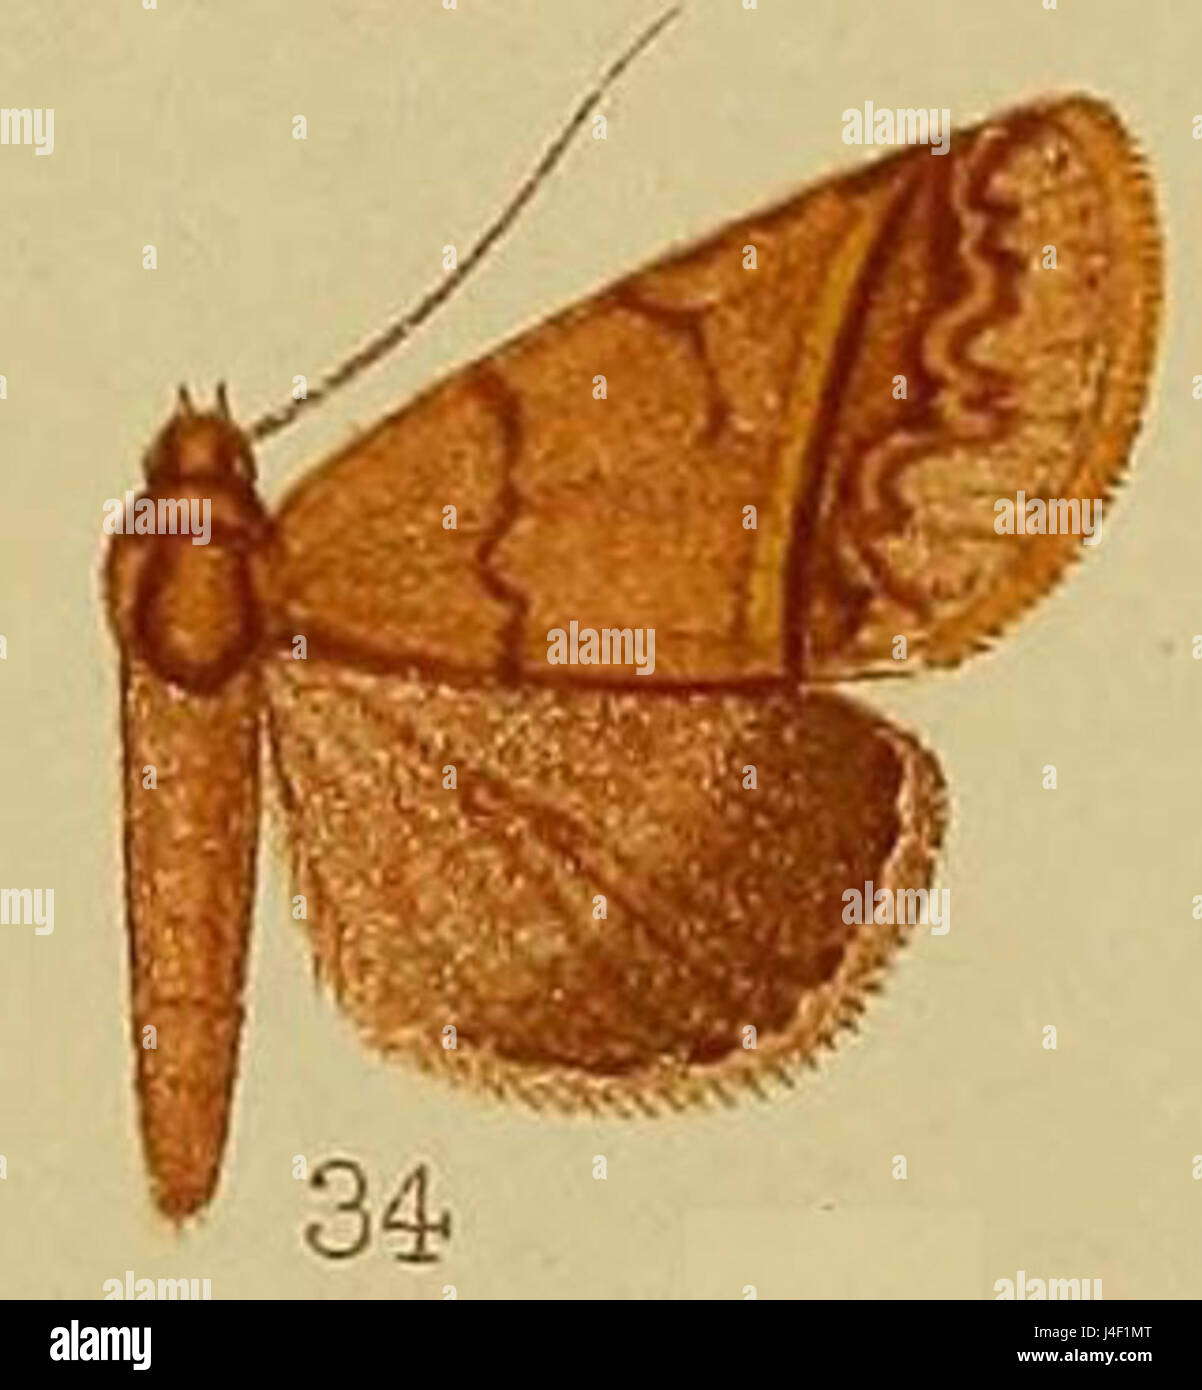 Pl.37 fig.34 Plecoptera thermozona Hampson  1910 - Stock Image